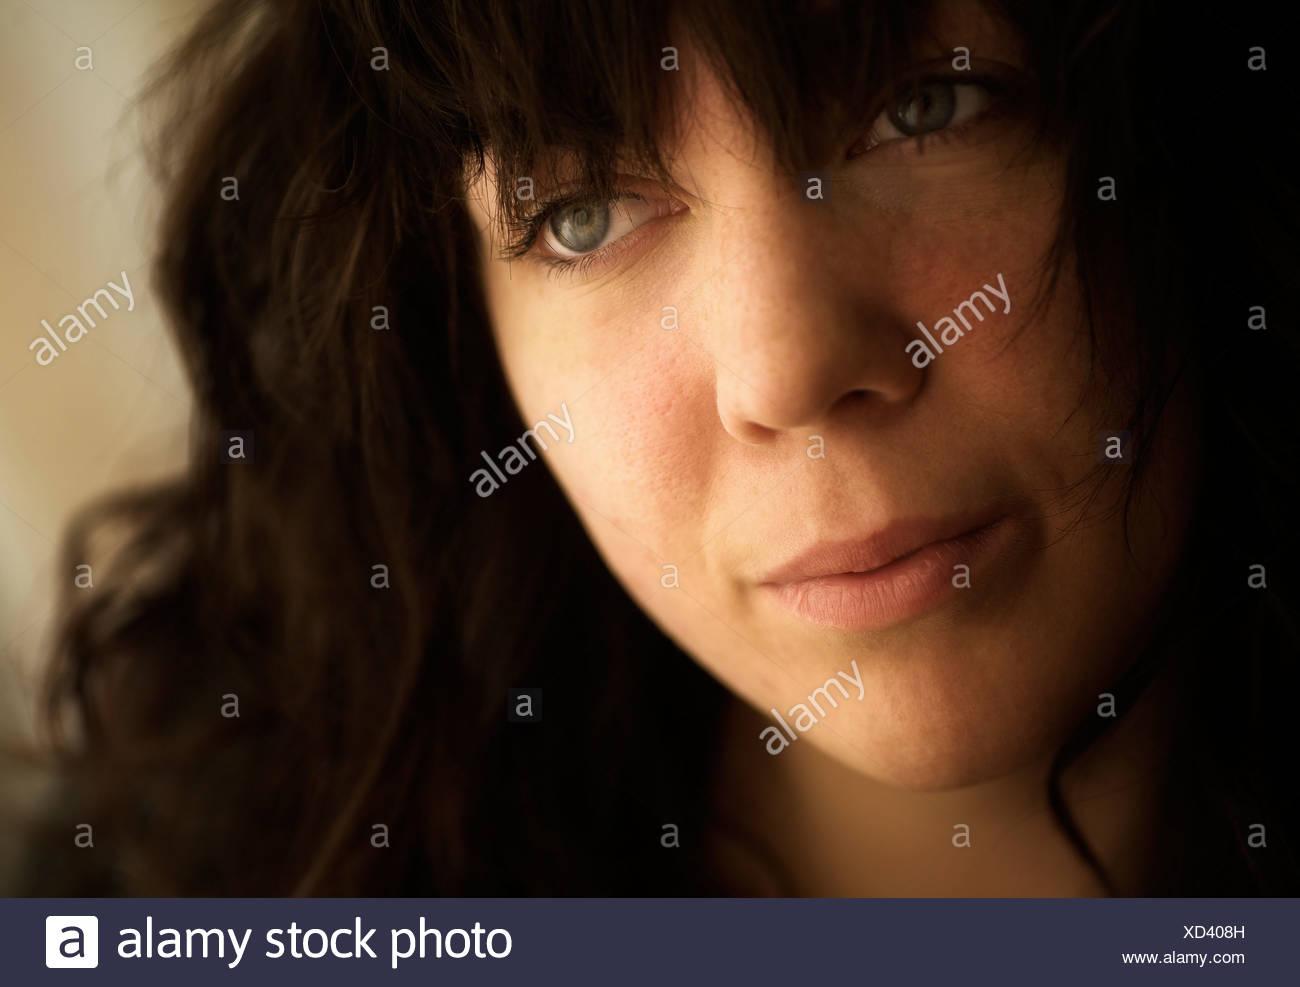 Woman looking sad - Stock Image